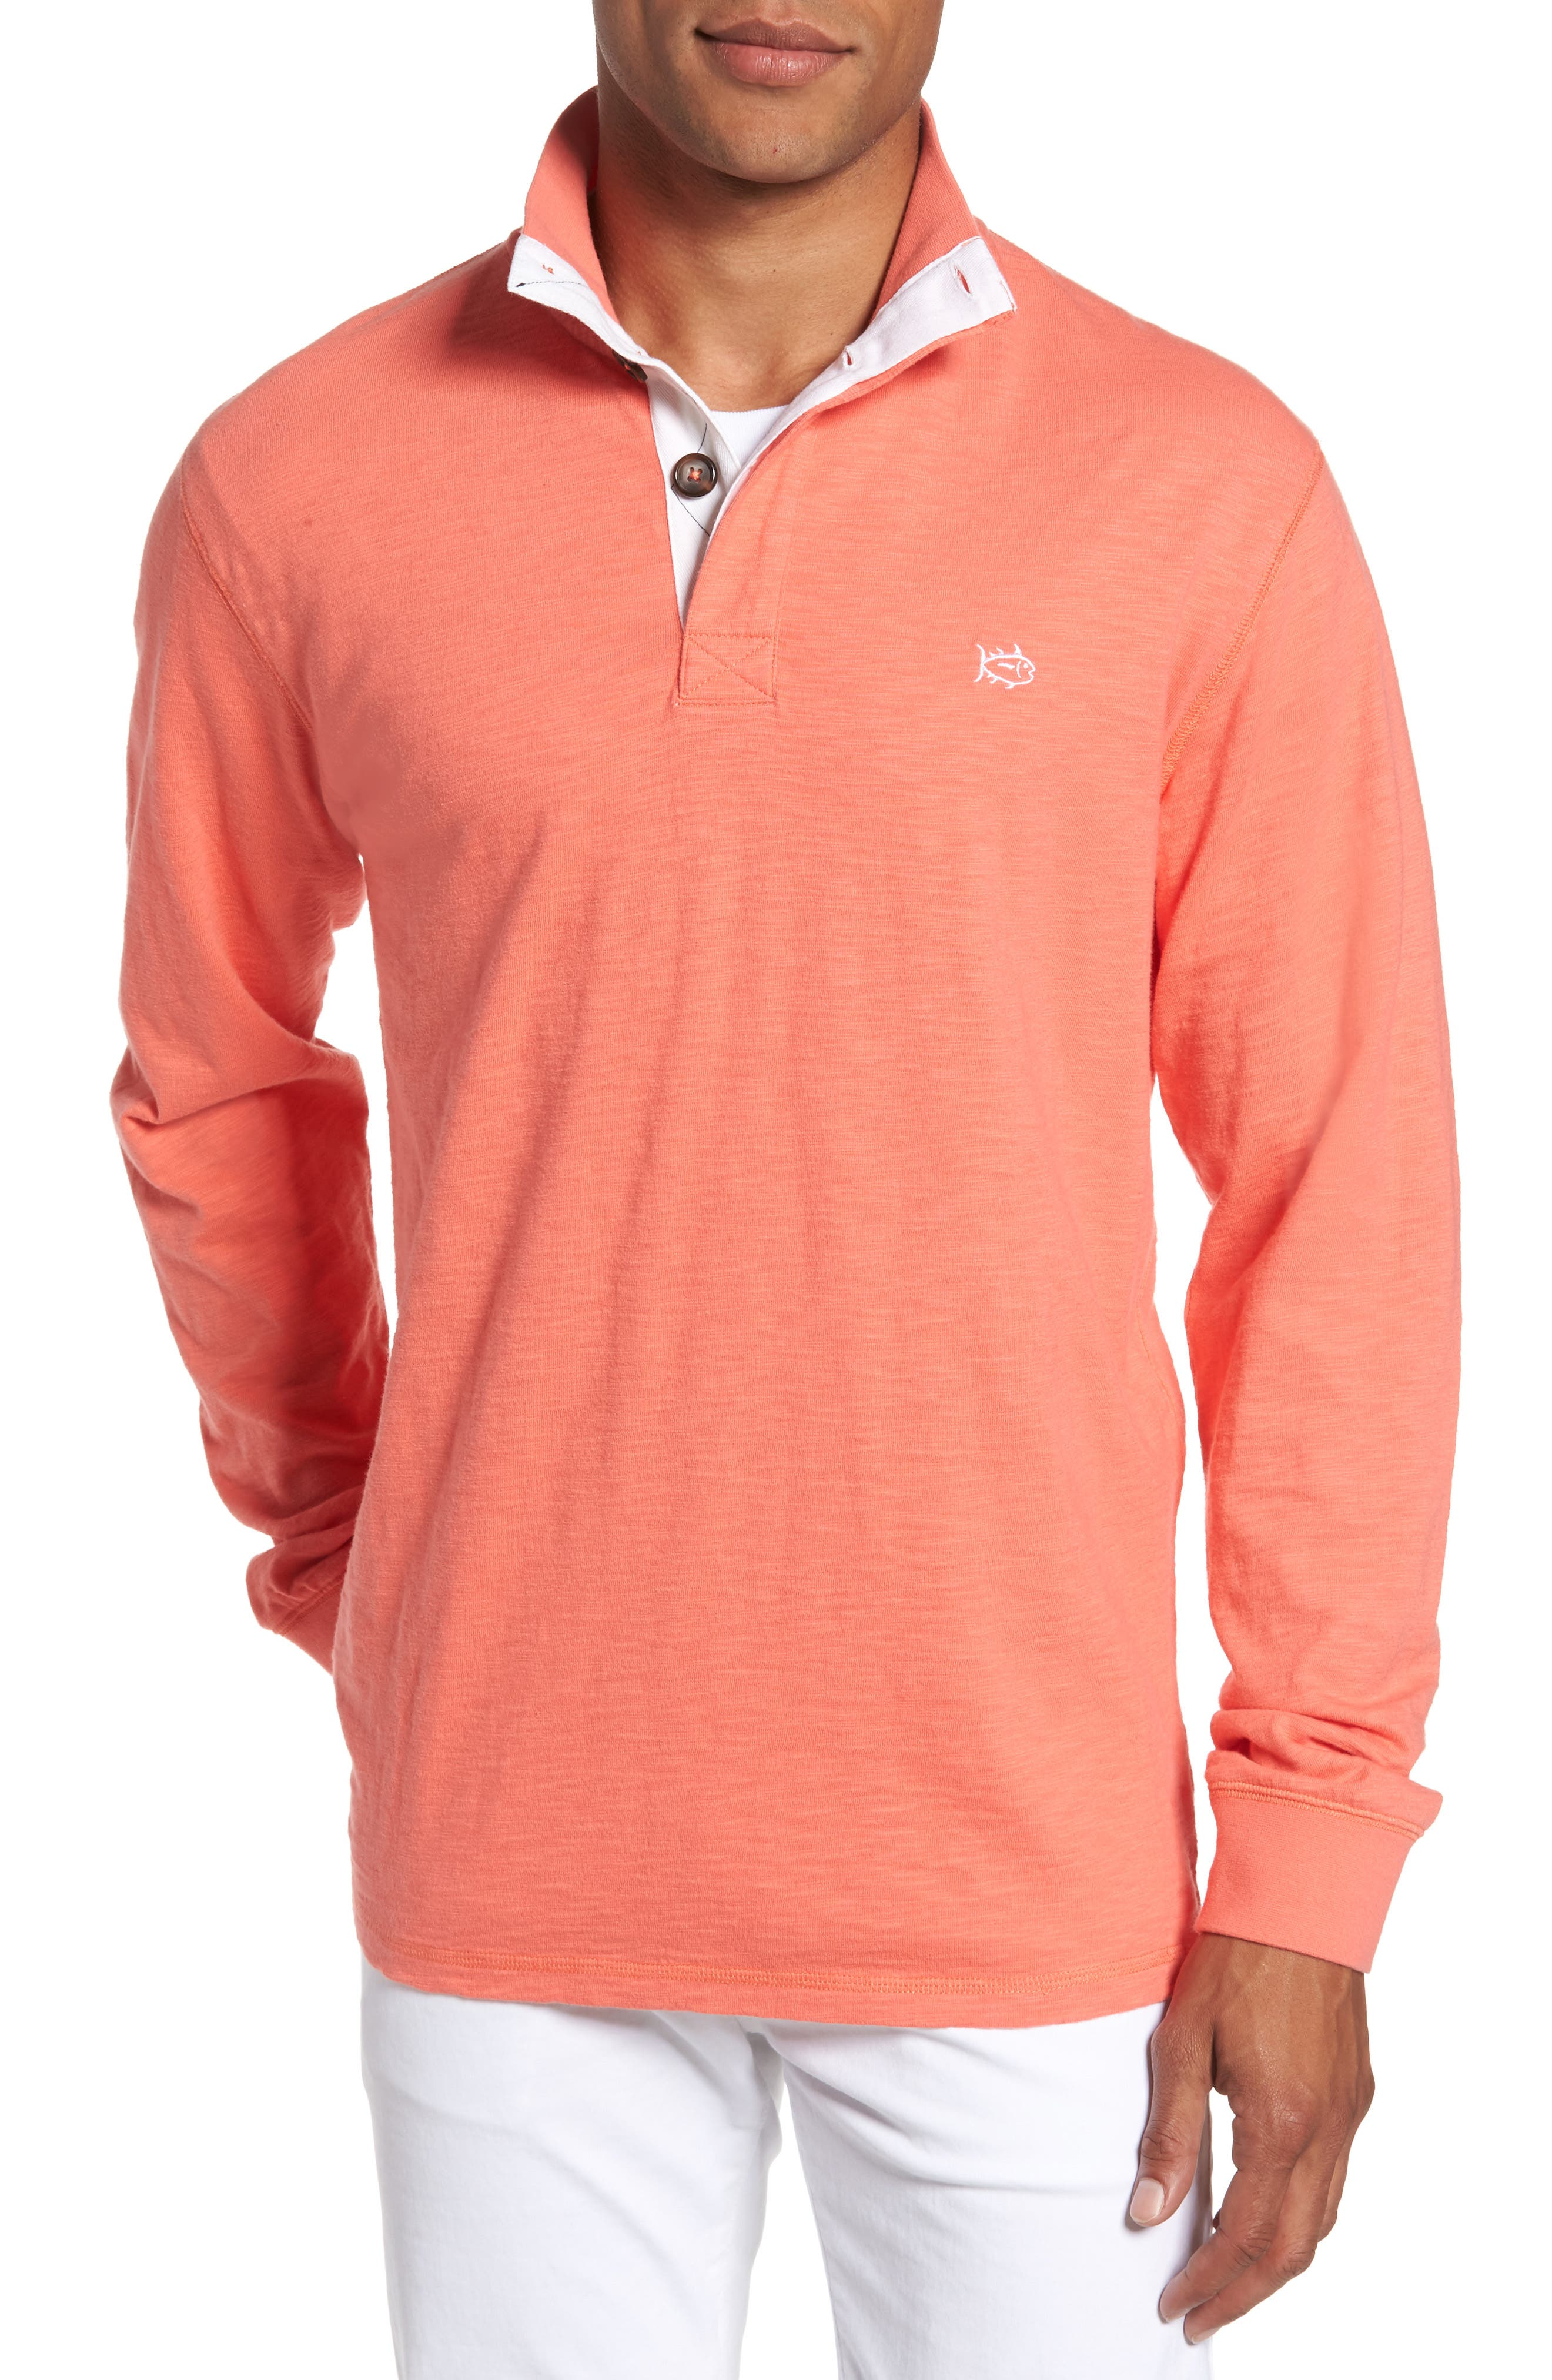 Gulf Stream Sweatshirt,                         Main,                         color, Melon